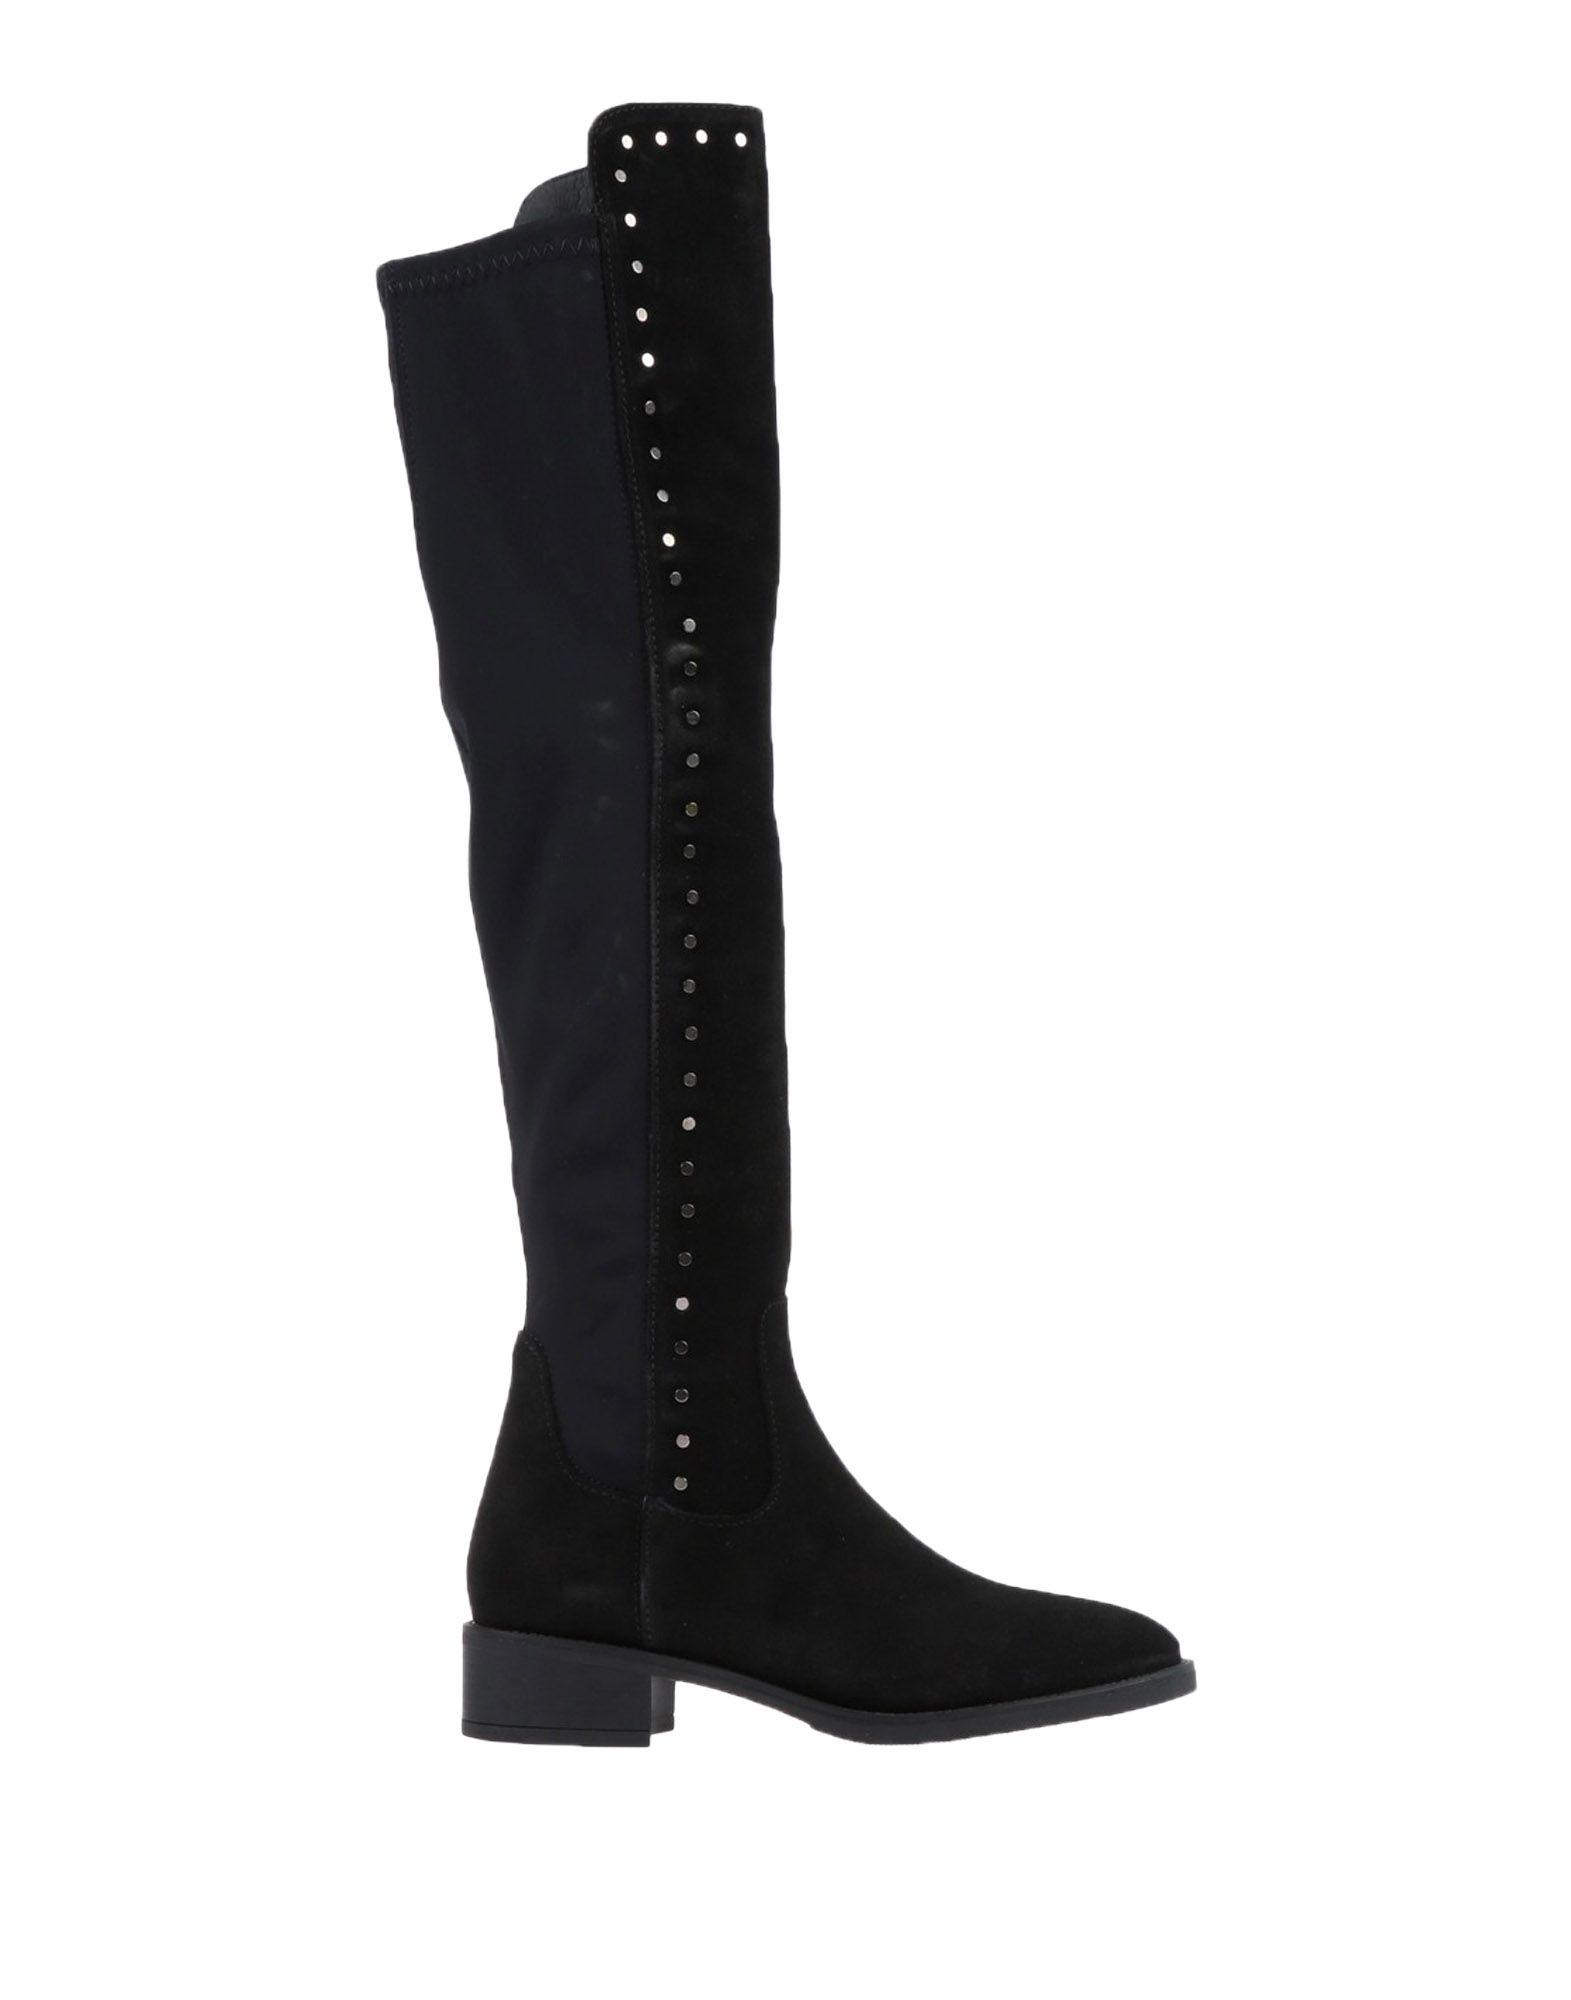 Alpe Woman Shoes Stiefel Damen  11531303NE Gute Qualität beliebte Schuhe